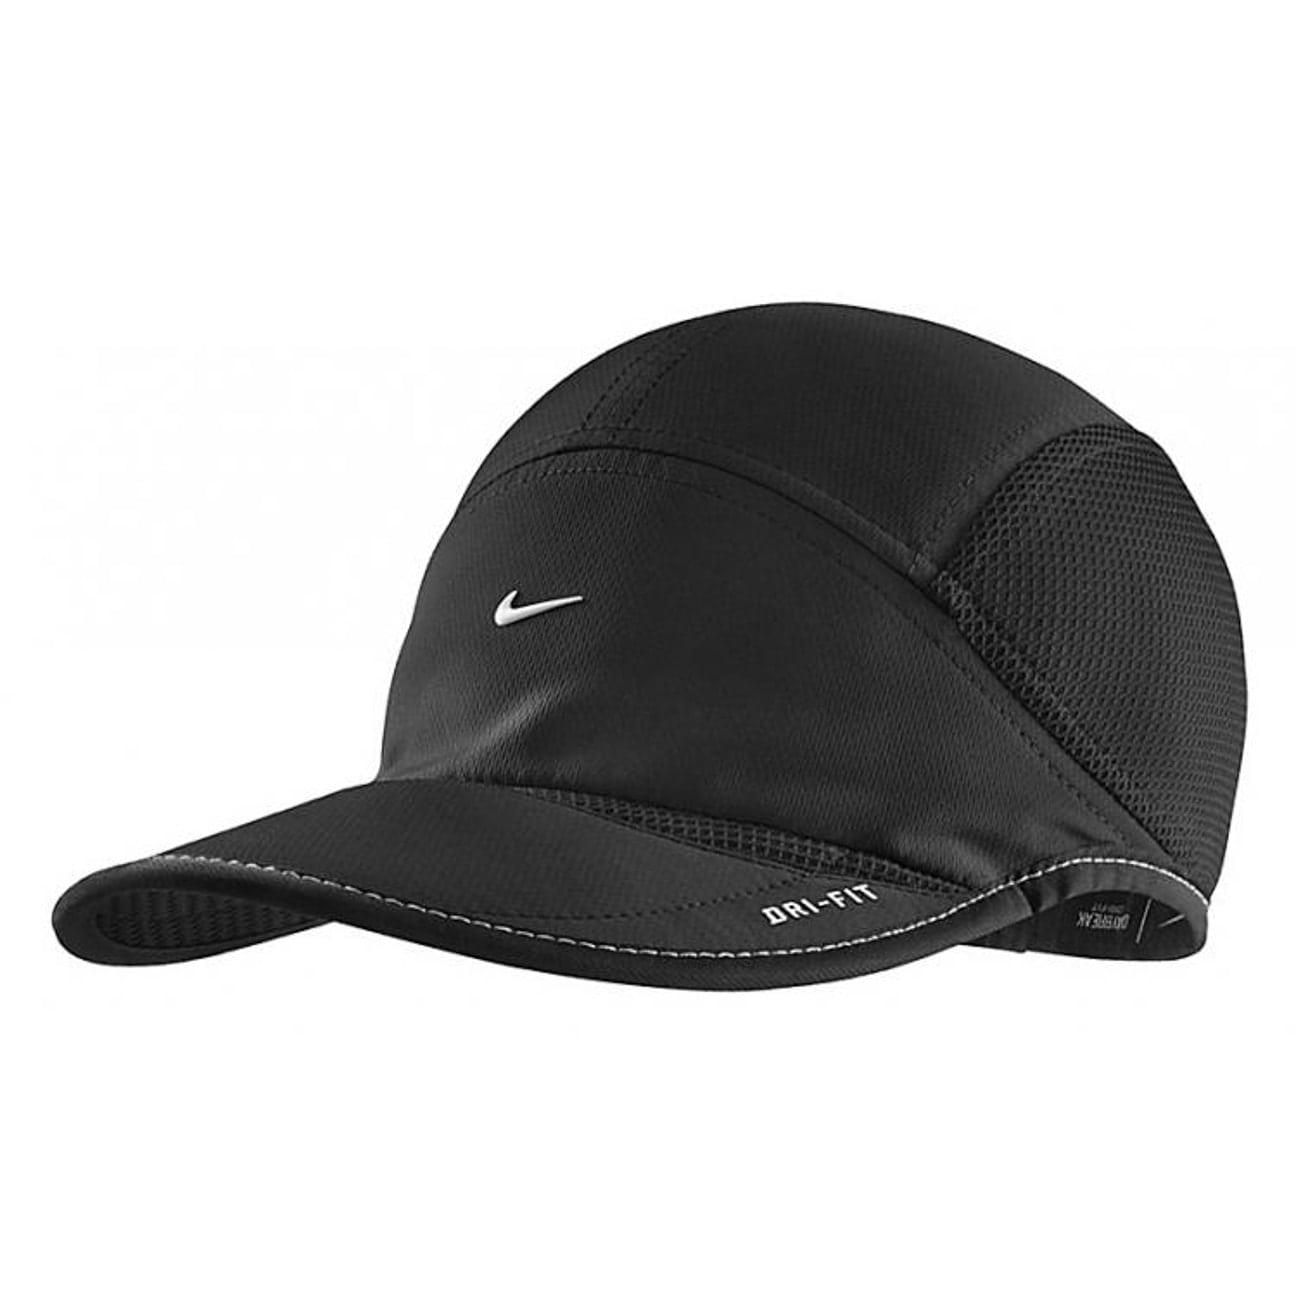 daybreak baseball cap by nike eur 19 95 hats caps. Black Bedroom Furniture Sets. Home Design Ideas